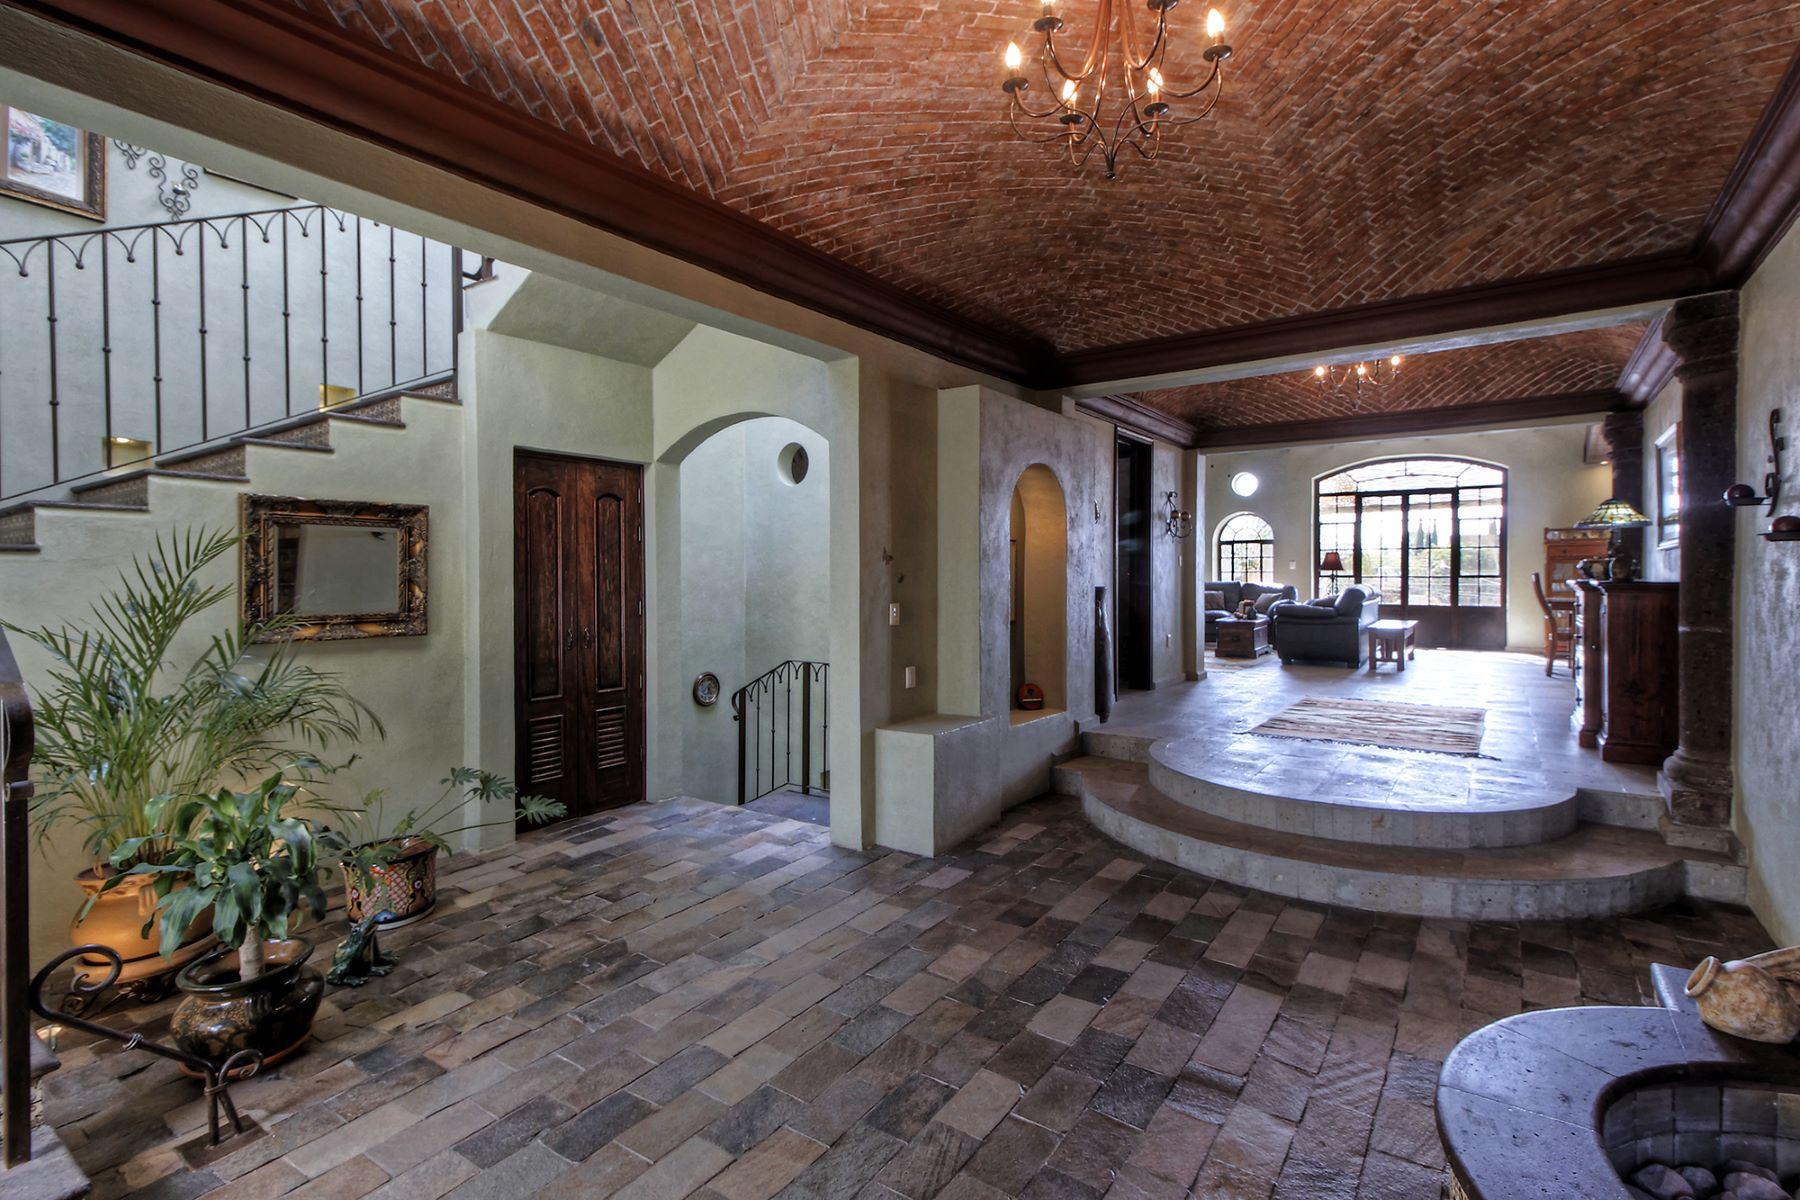 Частный односемейный дом для того Продажа на Casa San Miguelito Los Frailes, San Miguel De Allende, Guanajuato Мексика